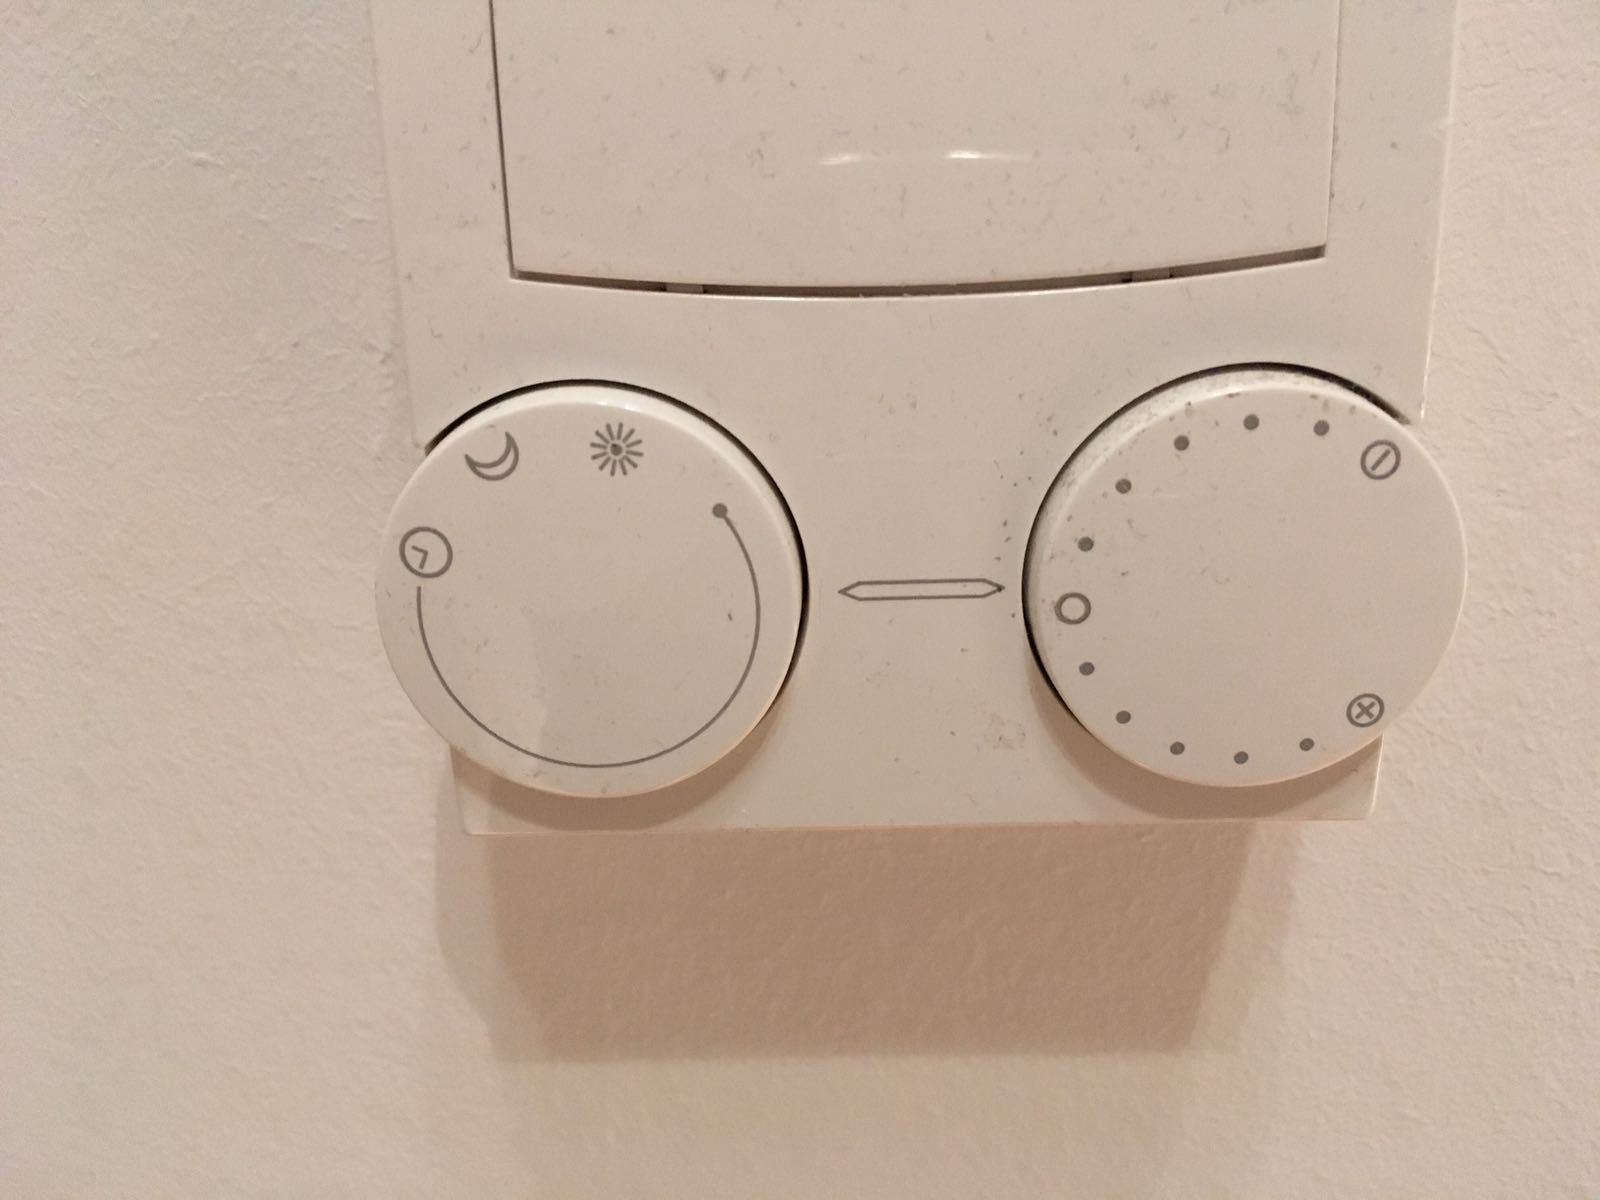 thermostat fu bodenheizung mit w rmepumpe wer weiss. Black Bedroom Furniture Sets. Home Design Ideas